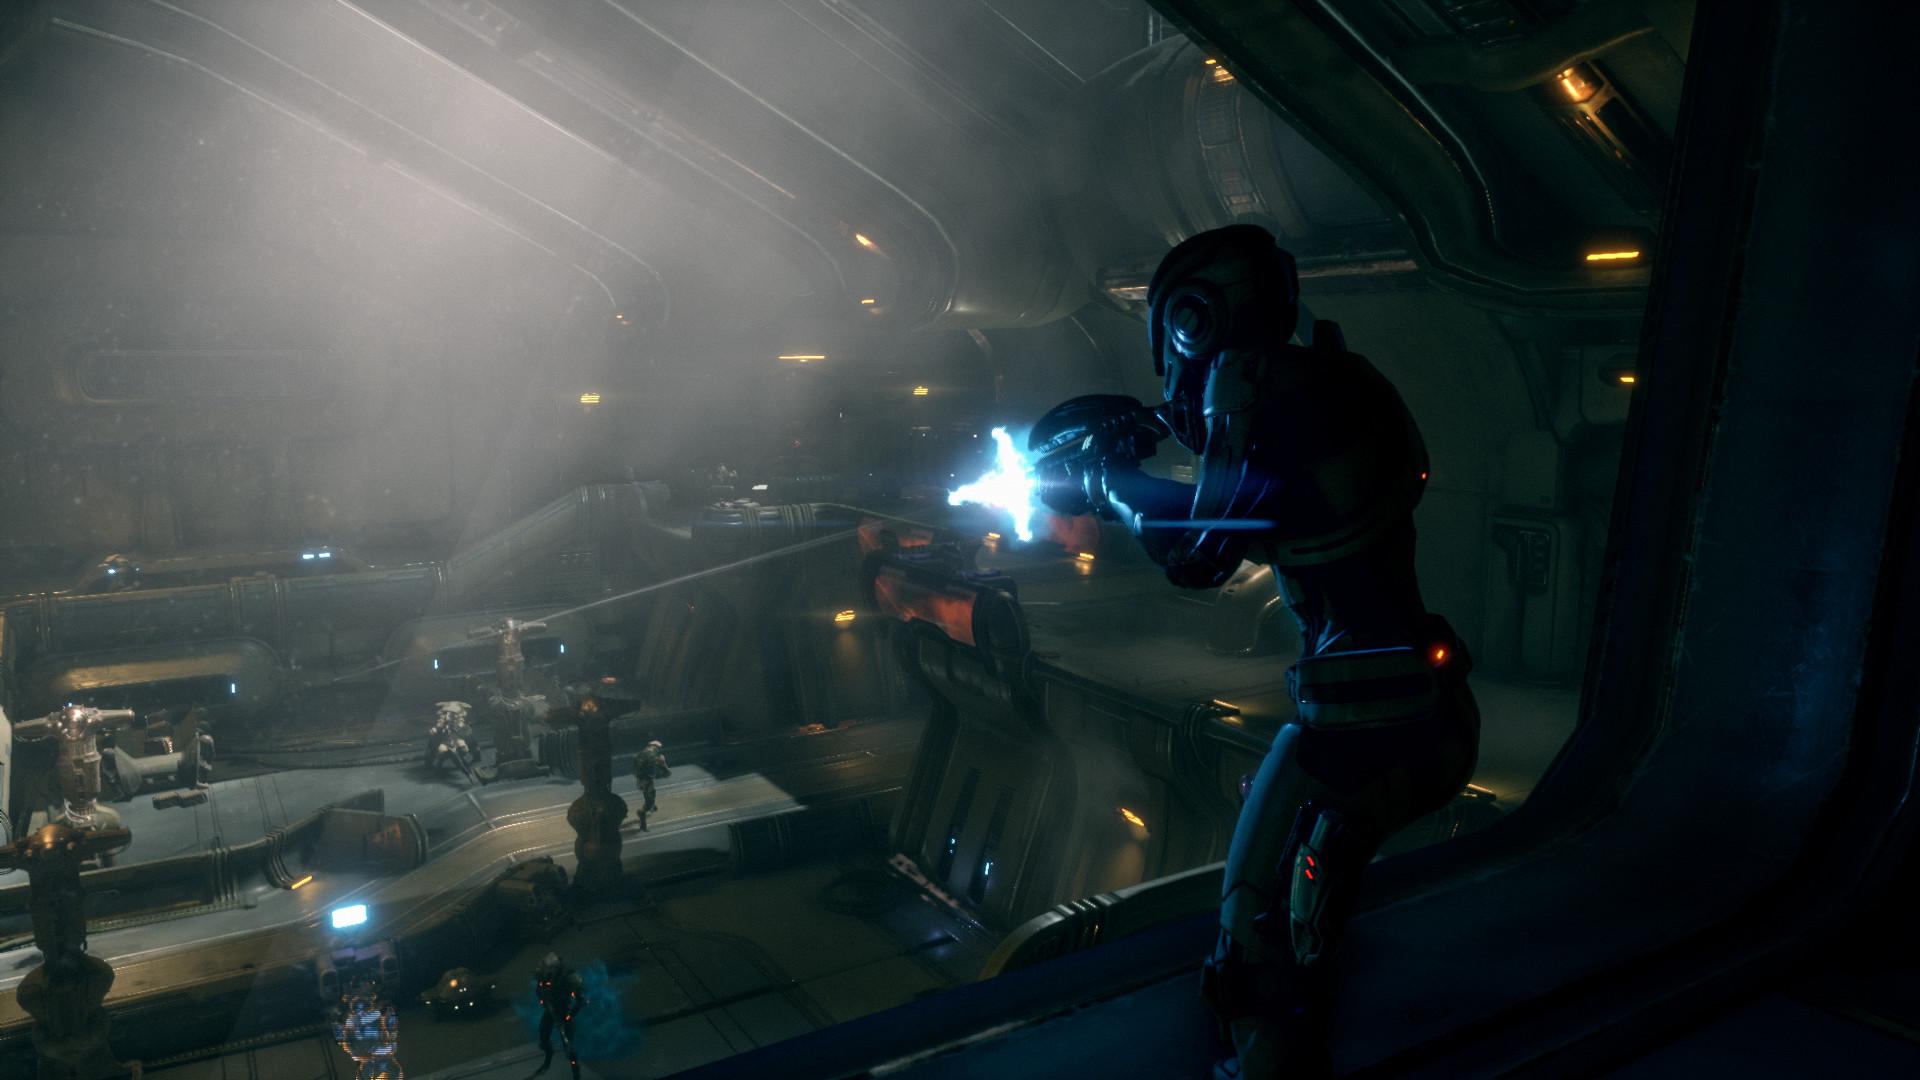 tmp 6893 bT26lyk 1283529830 N7 Day: Mass Effect Andromeda Screenshots Released